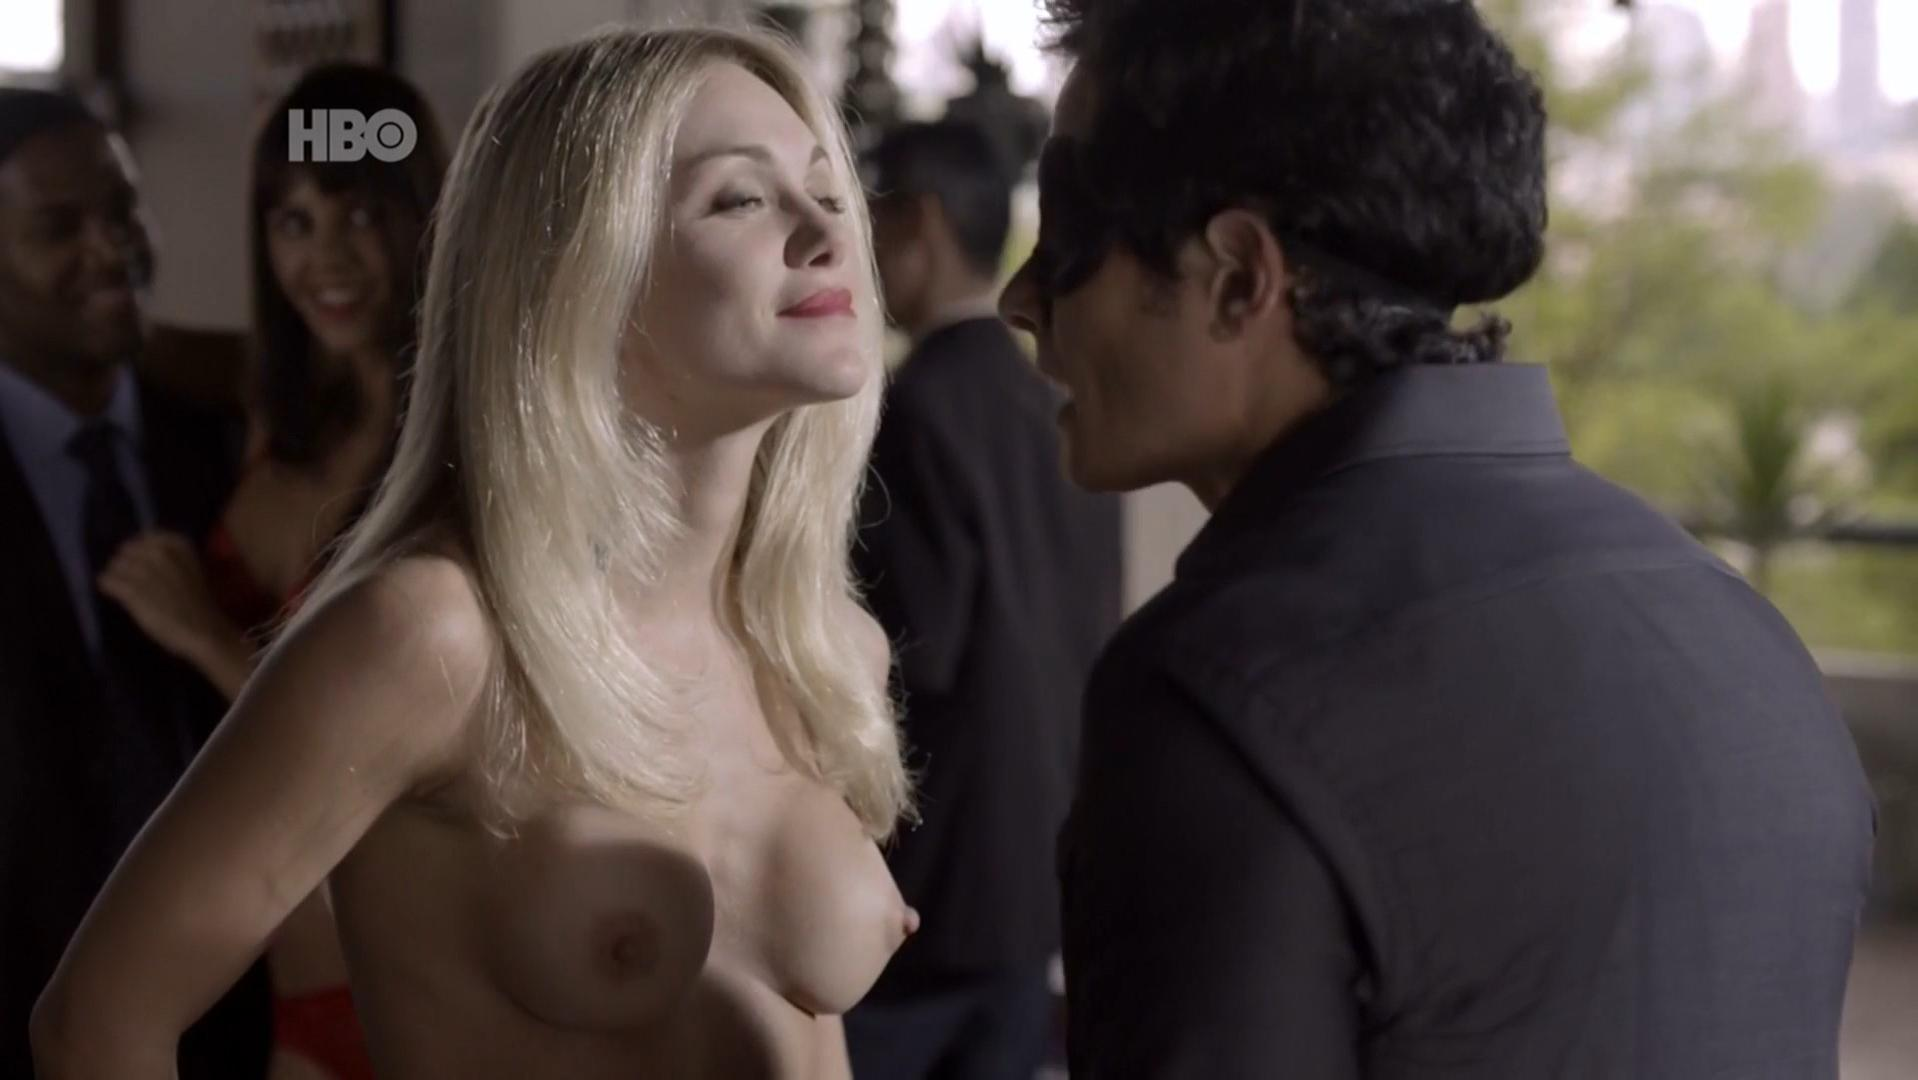 Joyce Almeida nude, Aline Samy nude - O Negocio s02e10 (2014)